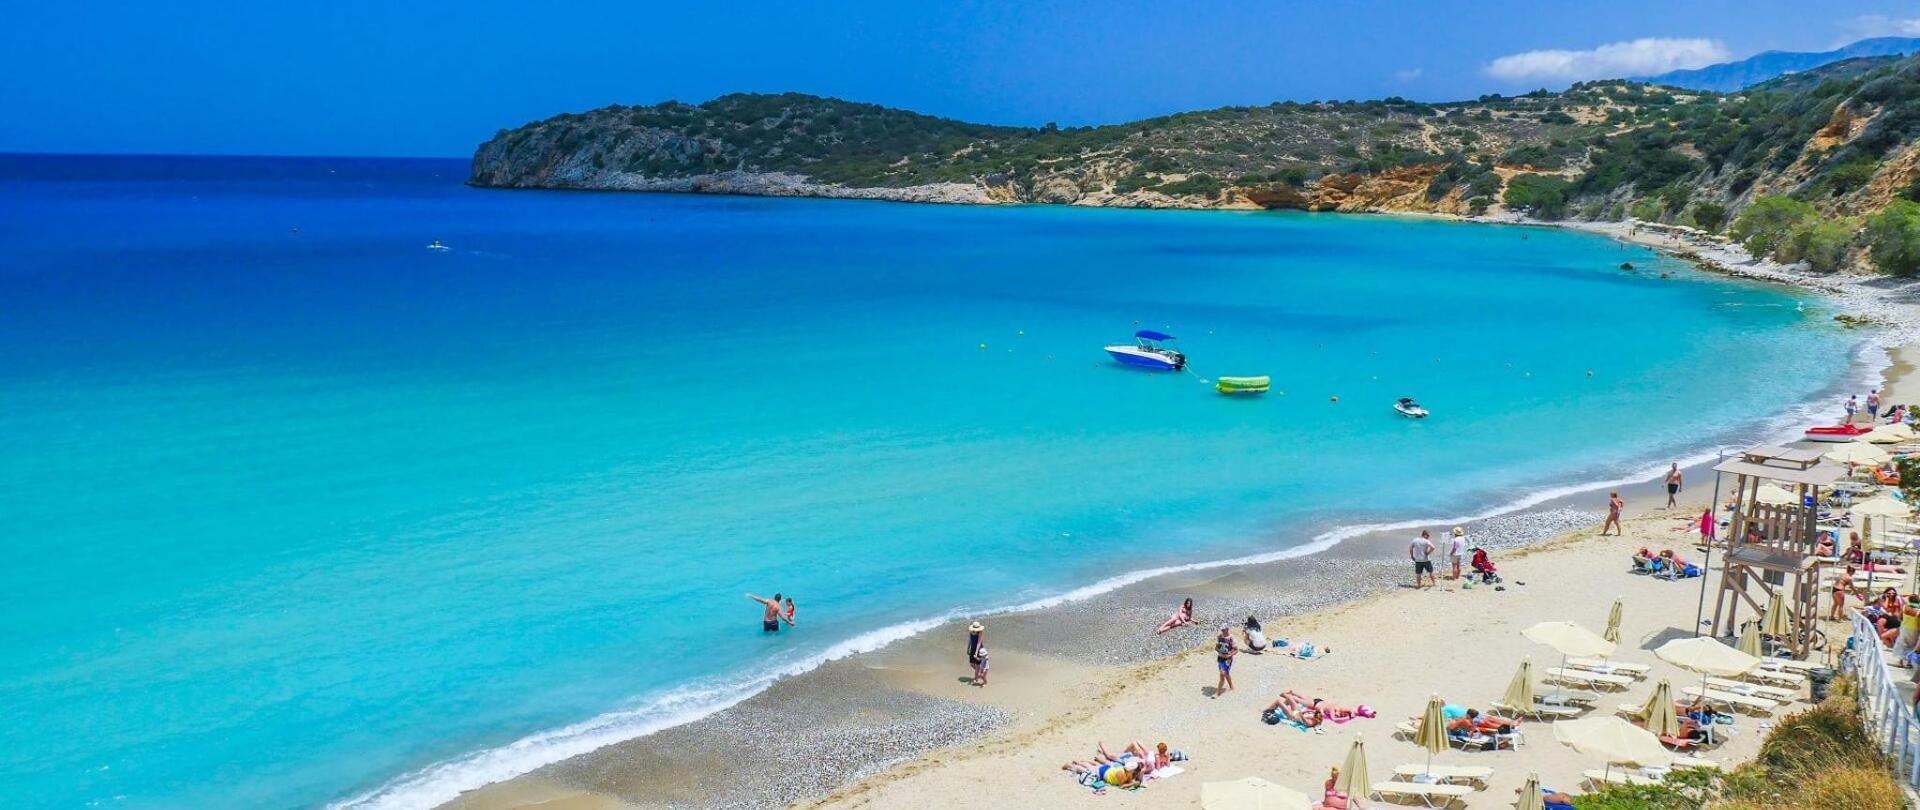 Voulisma-Beach-Agios-Nikolaos-Crete.jpg